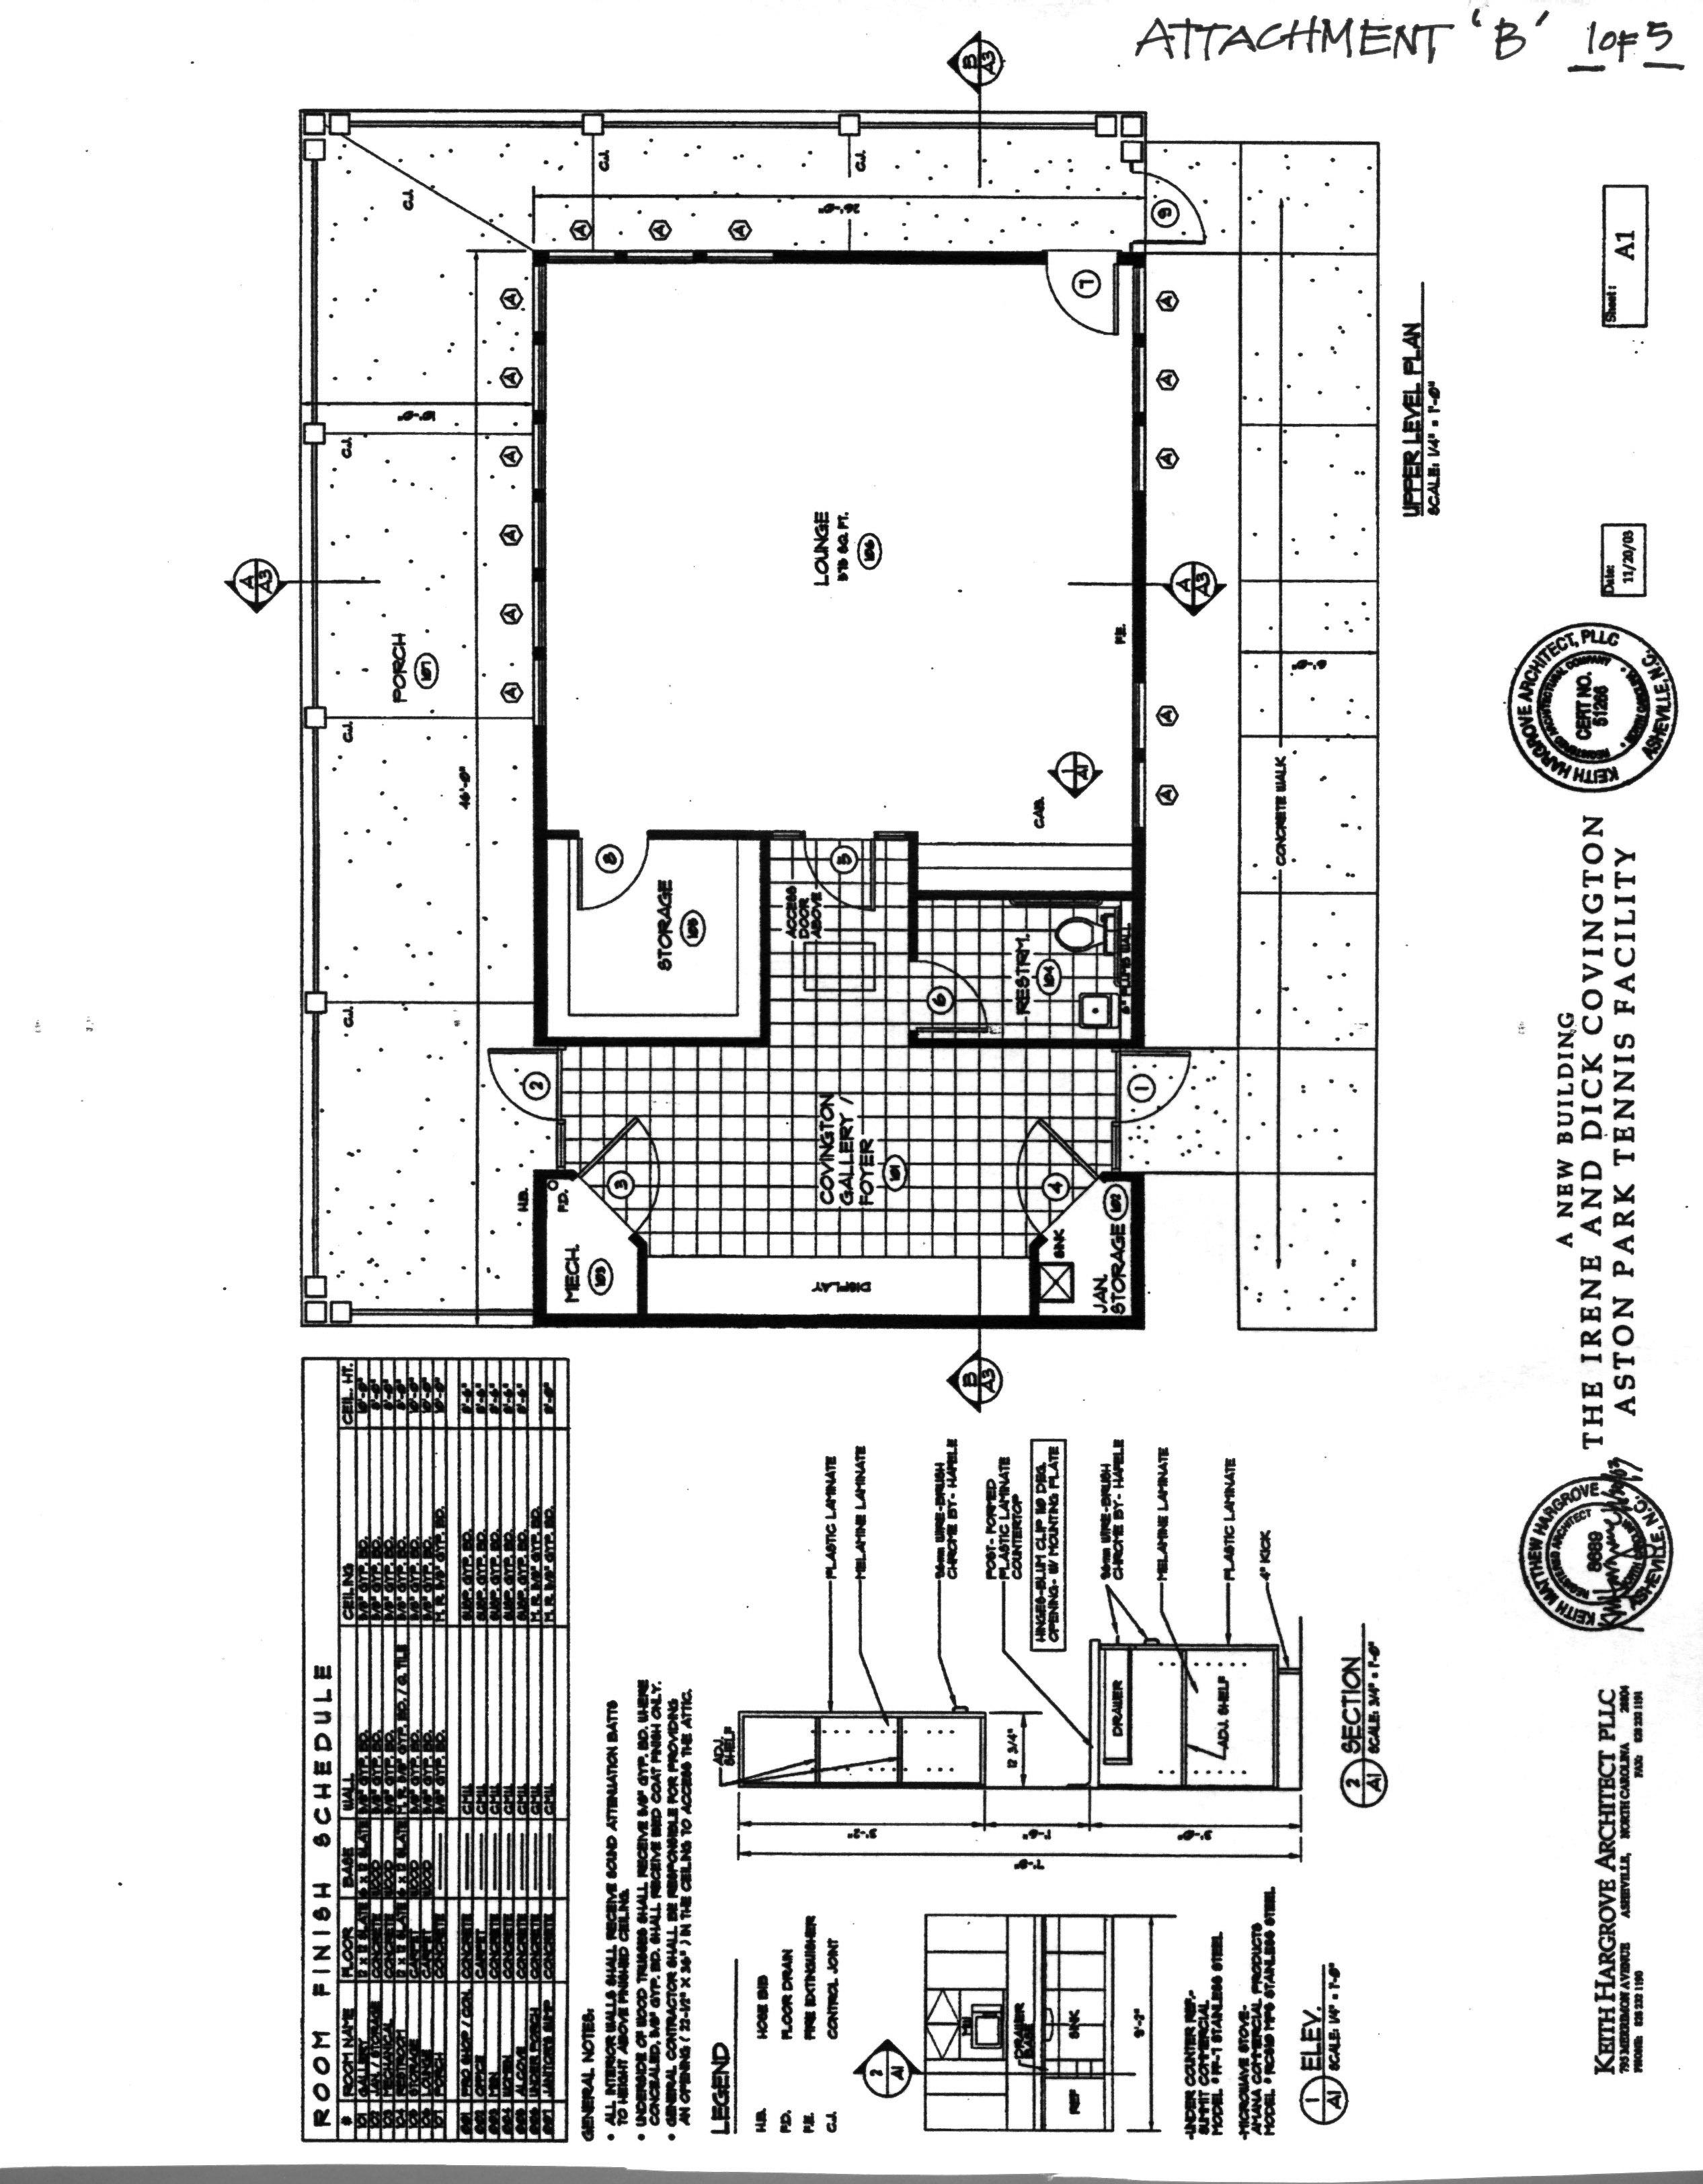 The big serve facility building usta for Playground blueprints